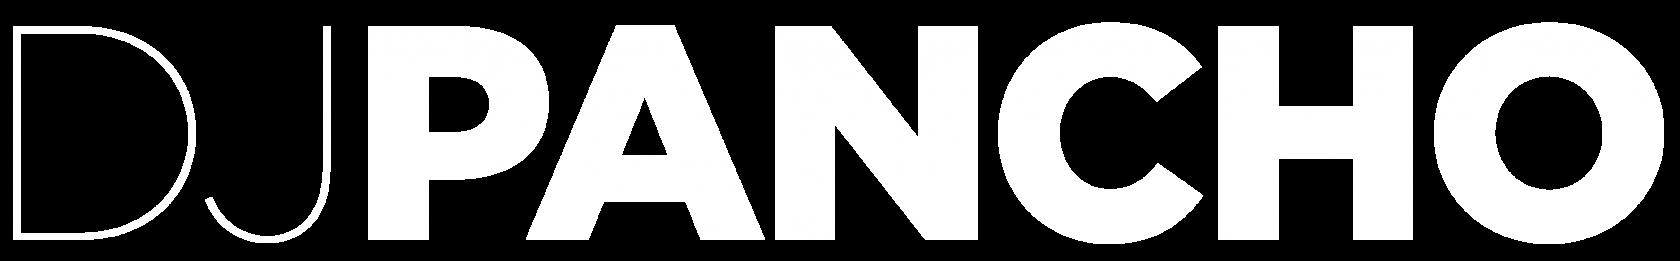 dj pancho